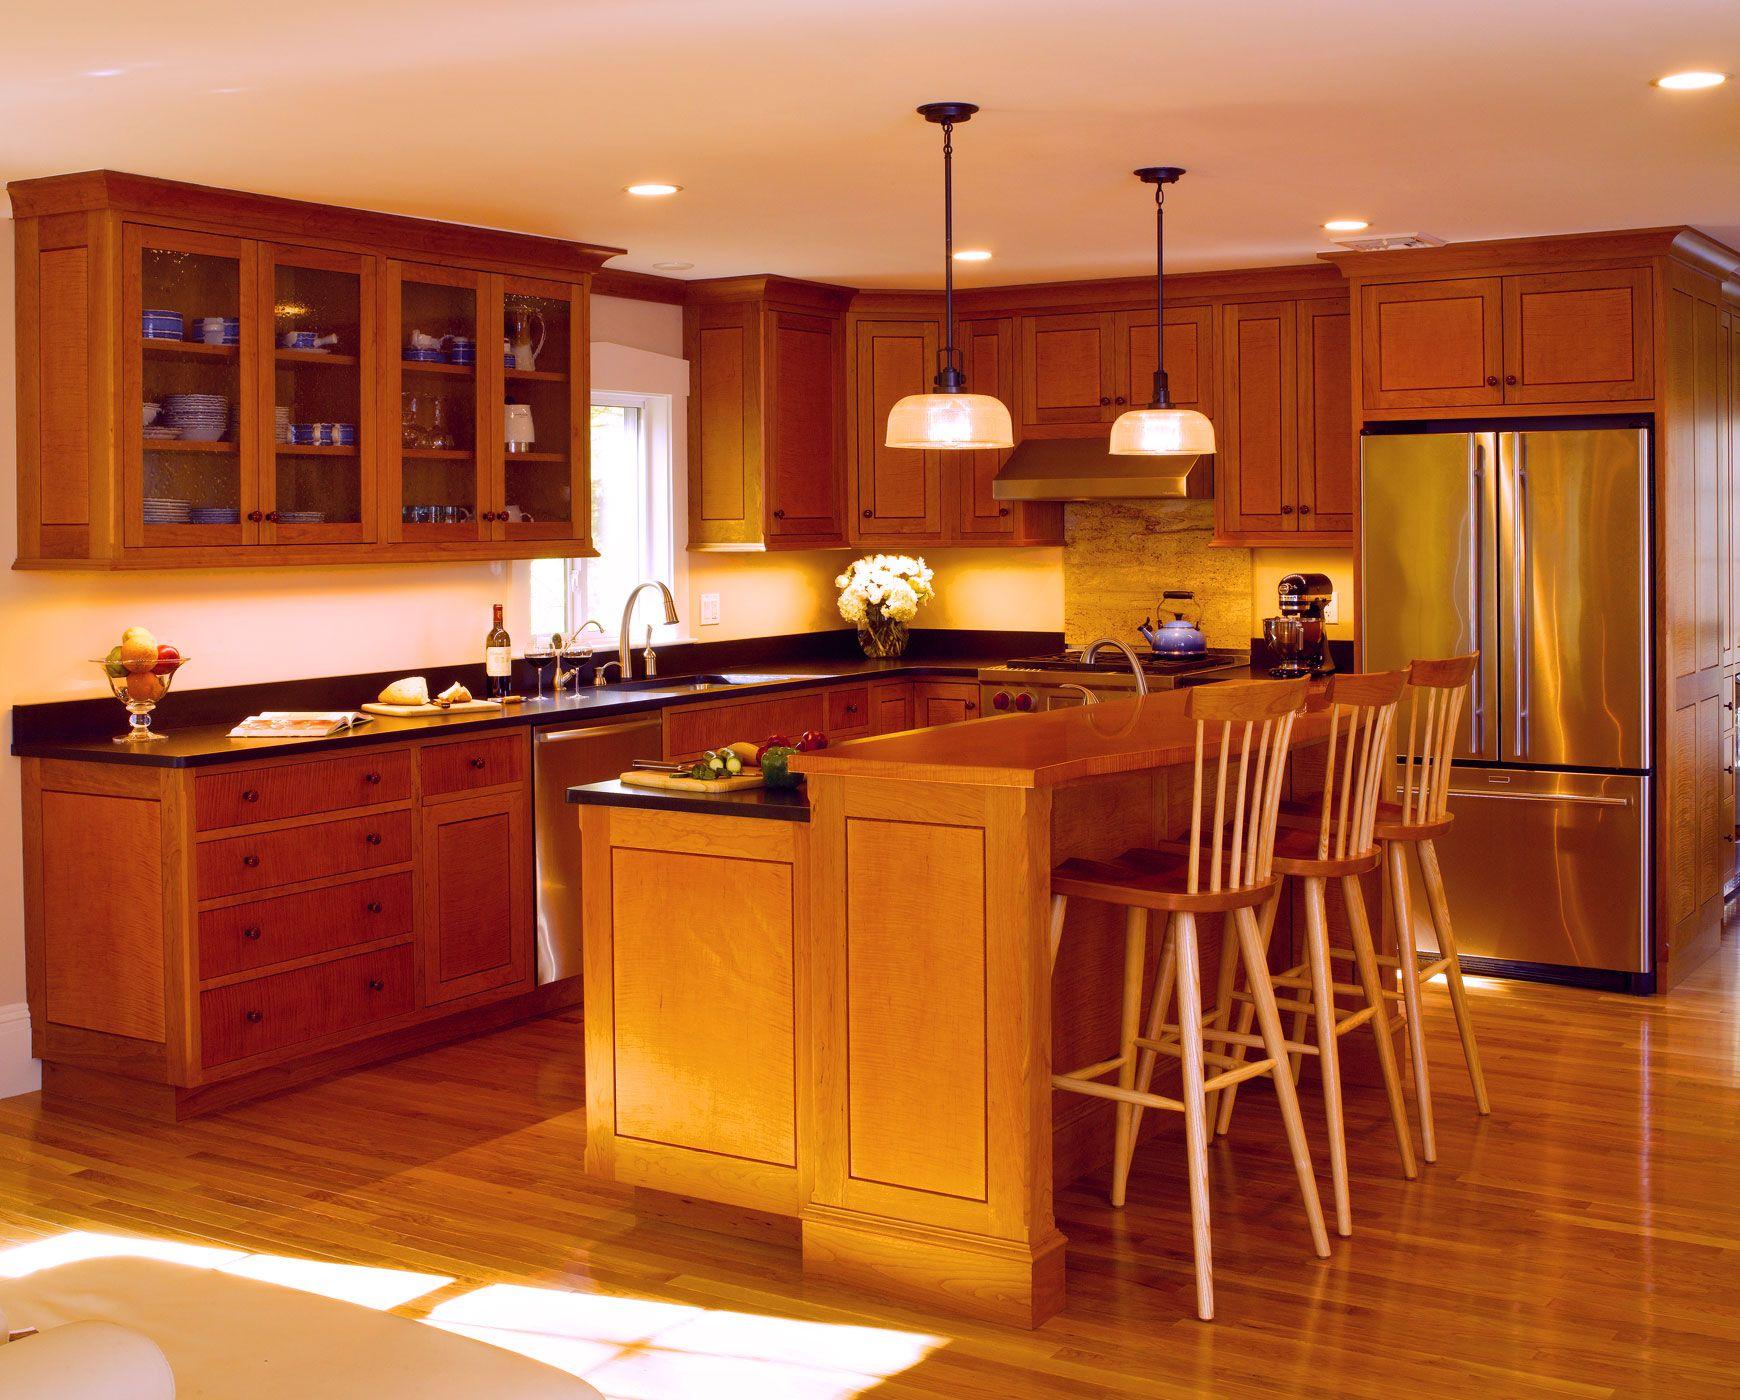 tiger maple cabinets   ... Dovetail Signature Kitchen ...